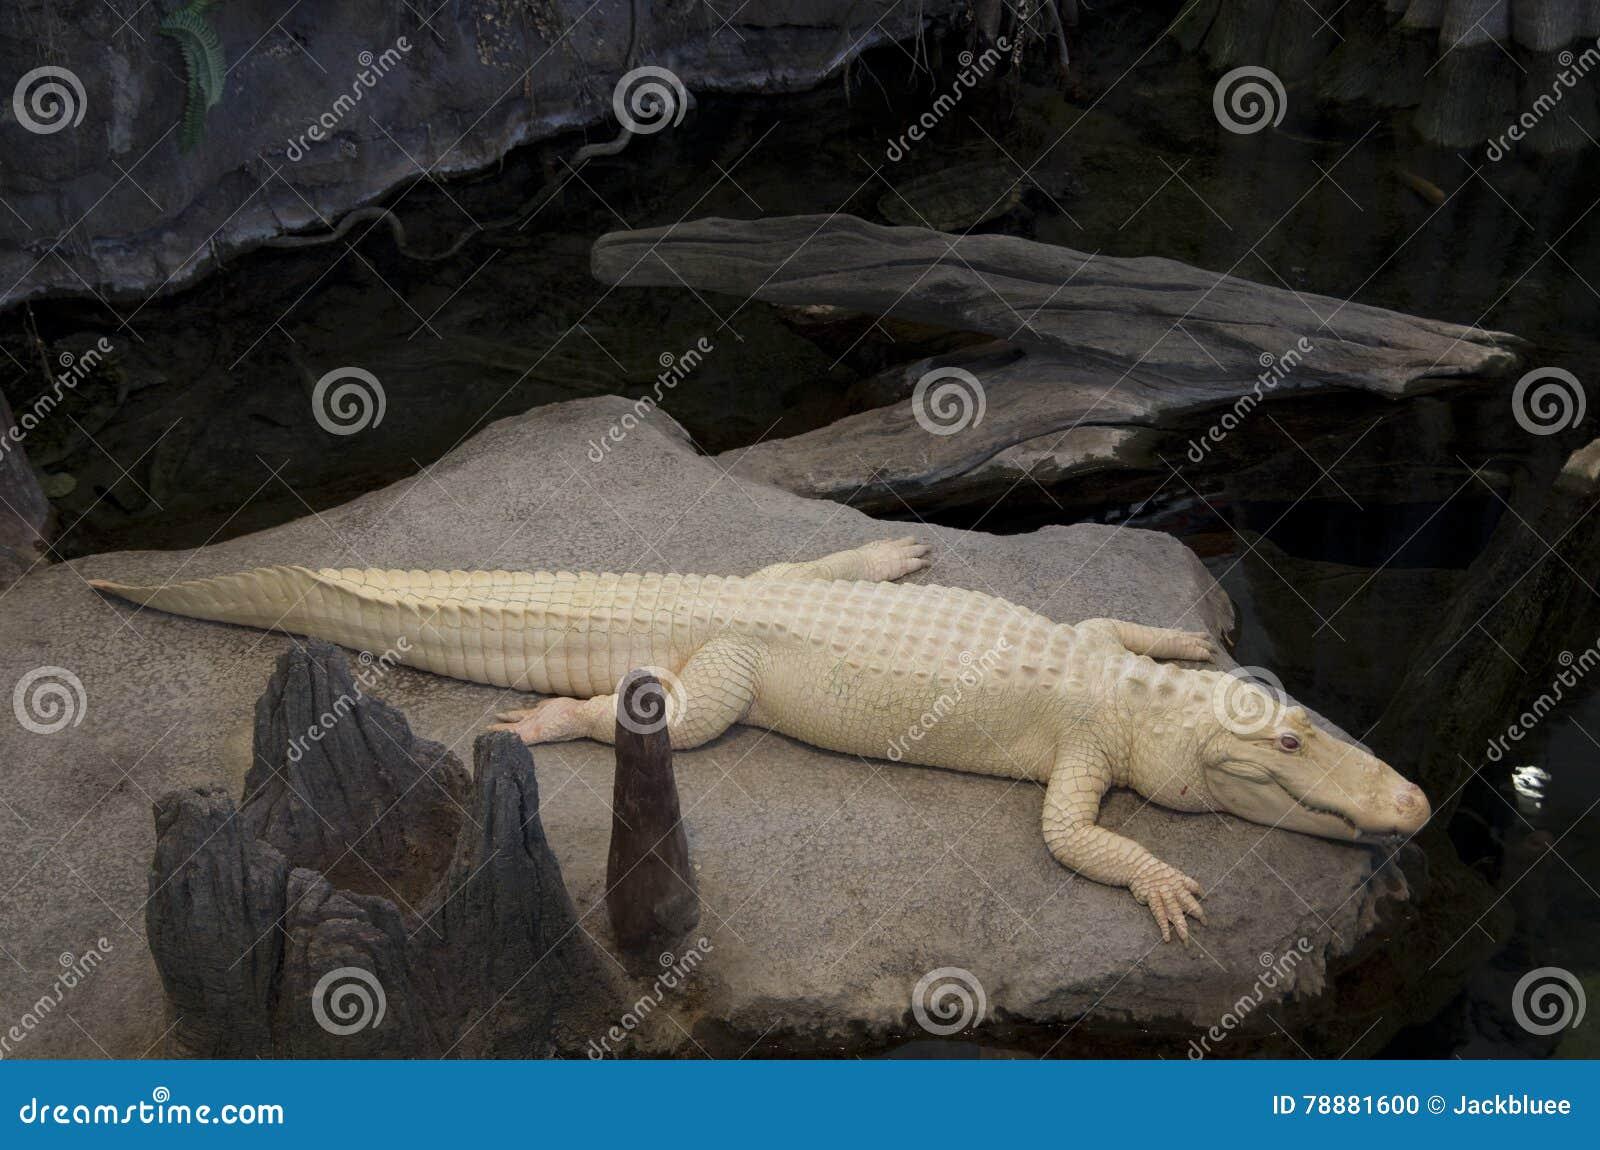 Alligator California Academy of Sciences